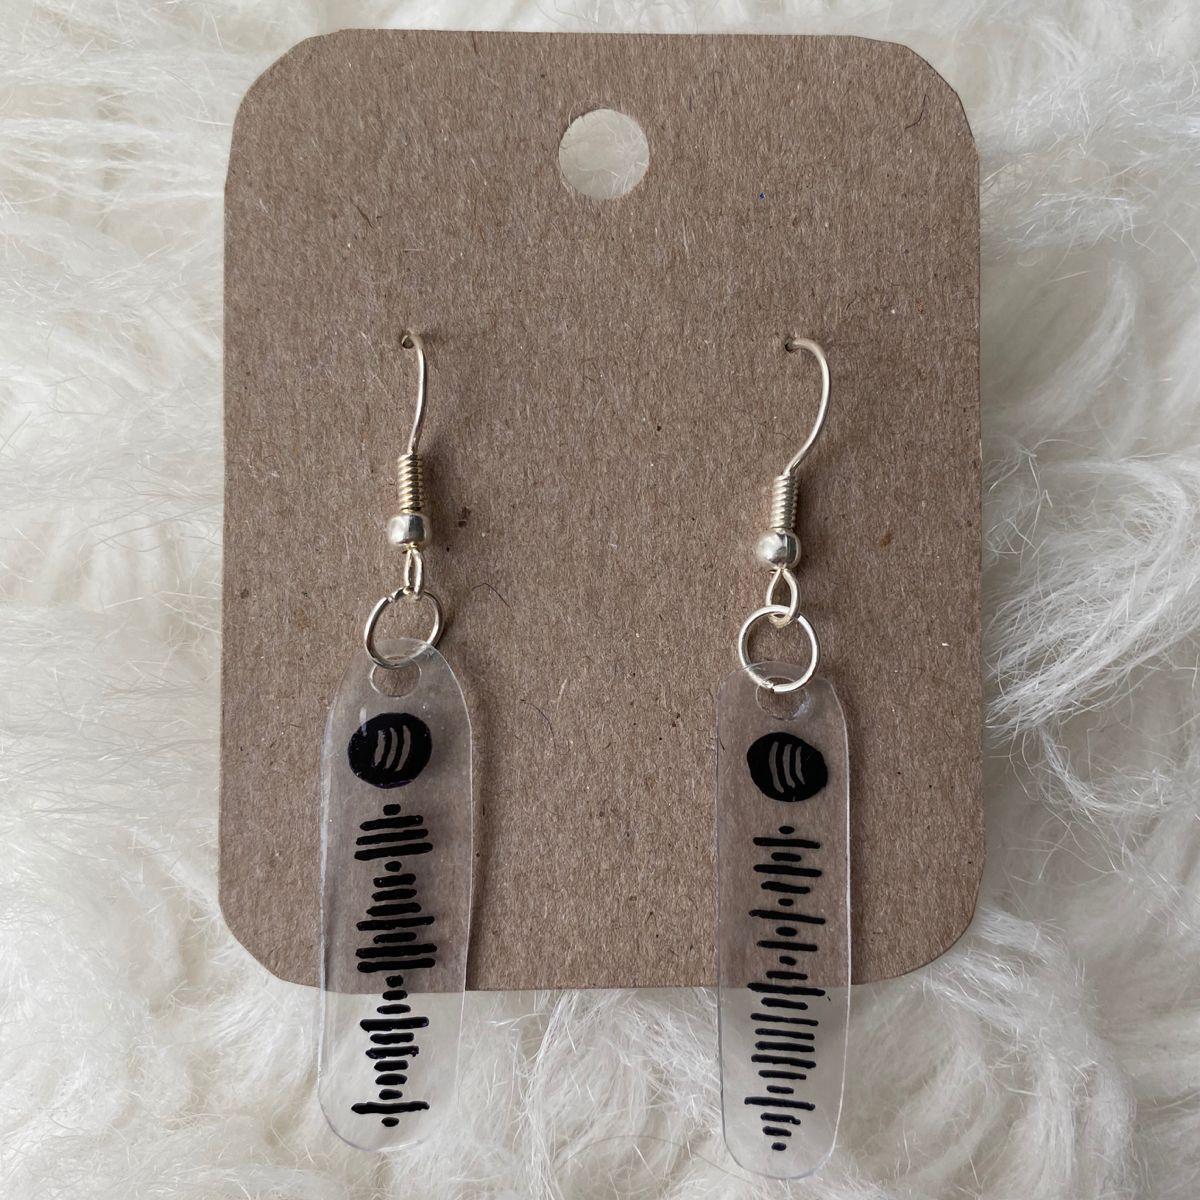 Custom spotify code earrings quirky earrings homemade